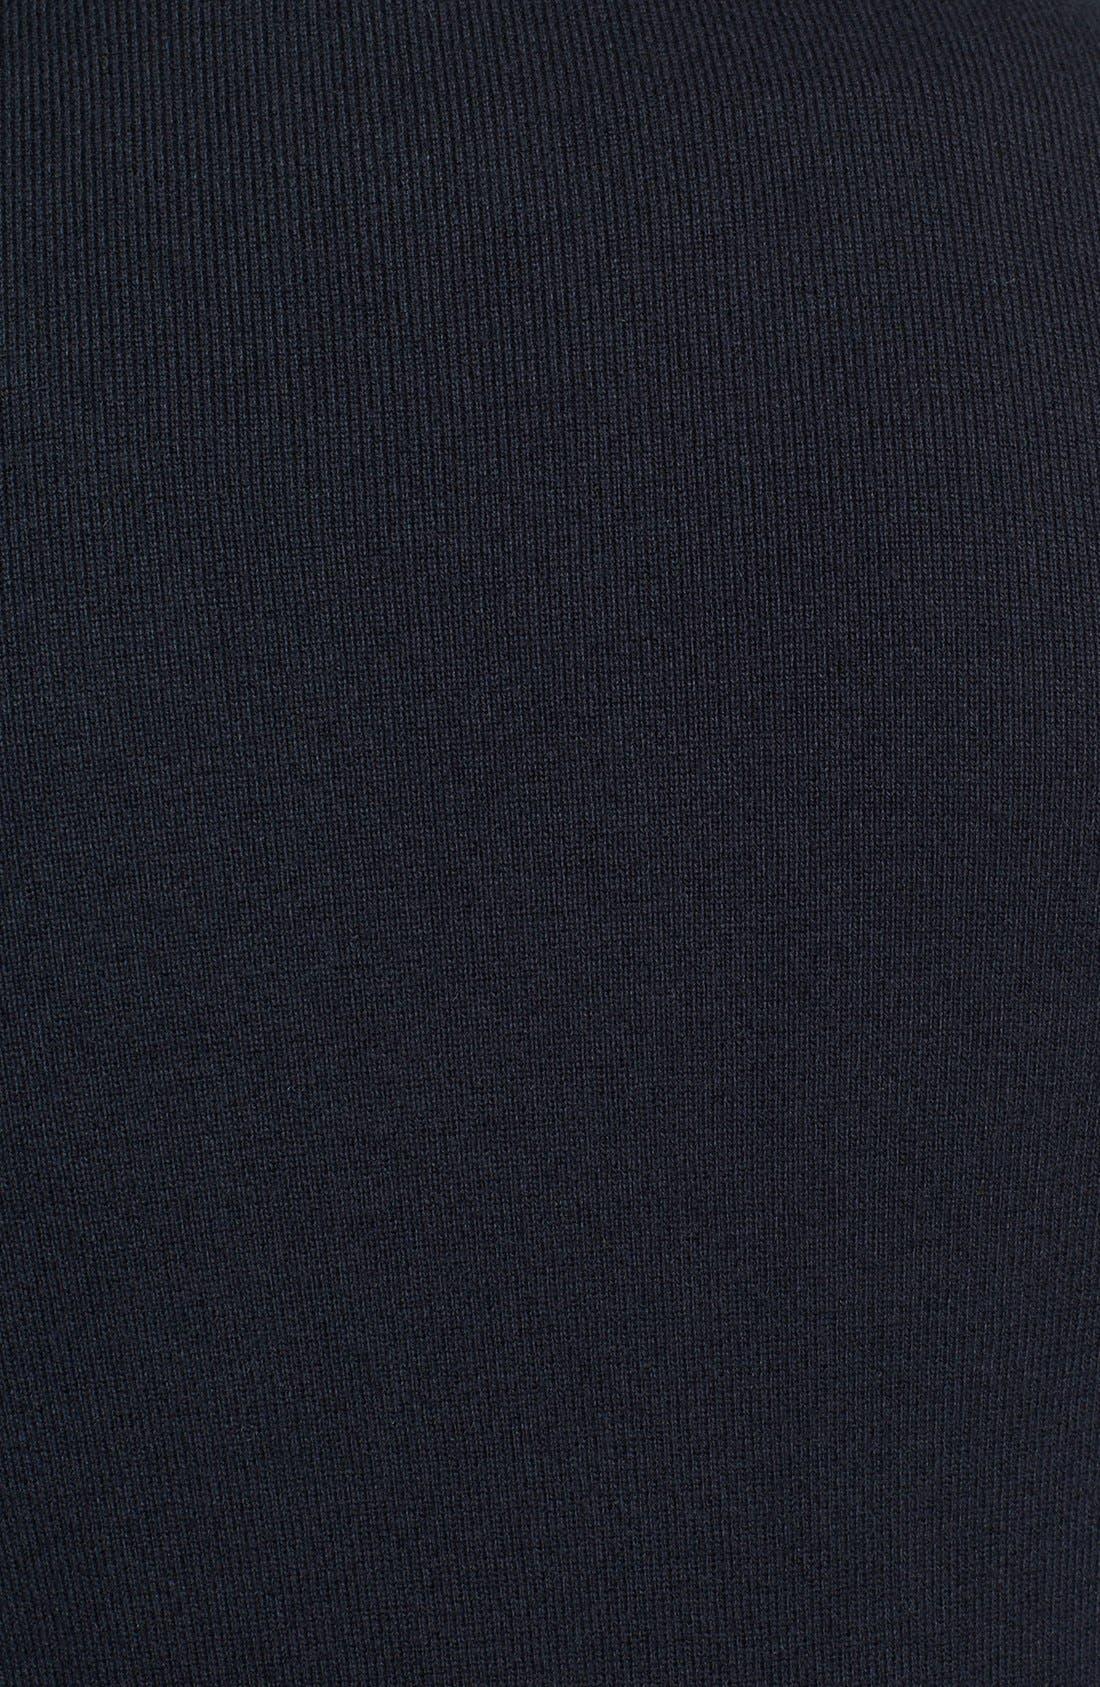 Alternate Image 3  - Façonnable Sweater Wool & Cotton Vest